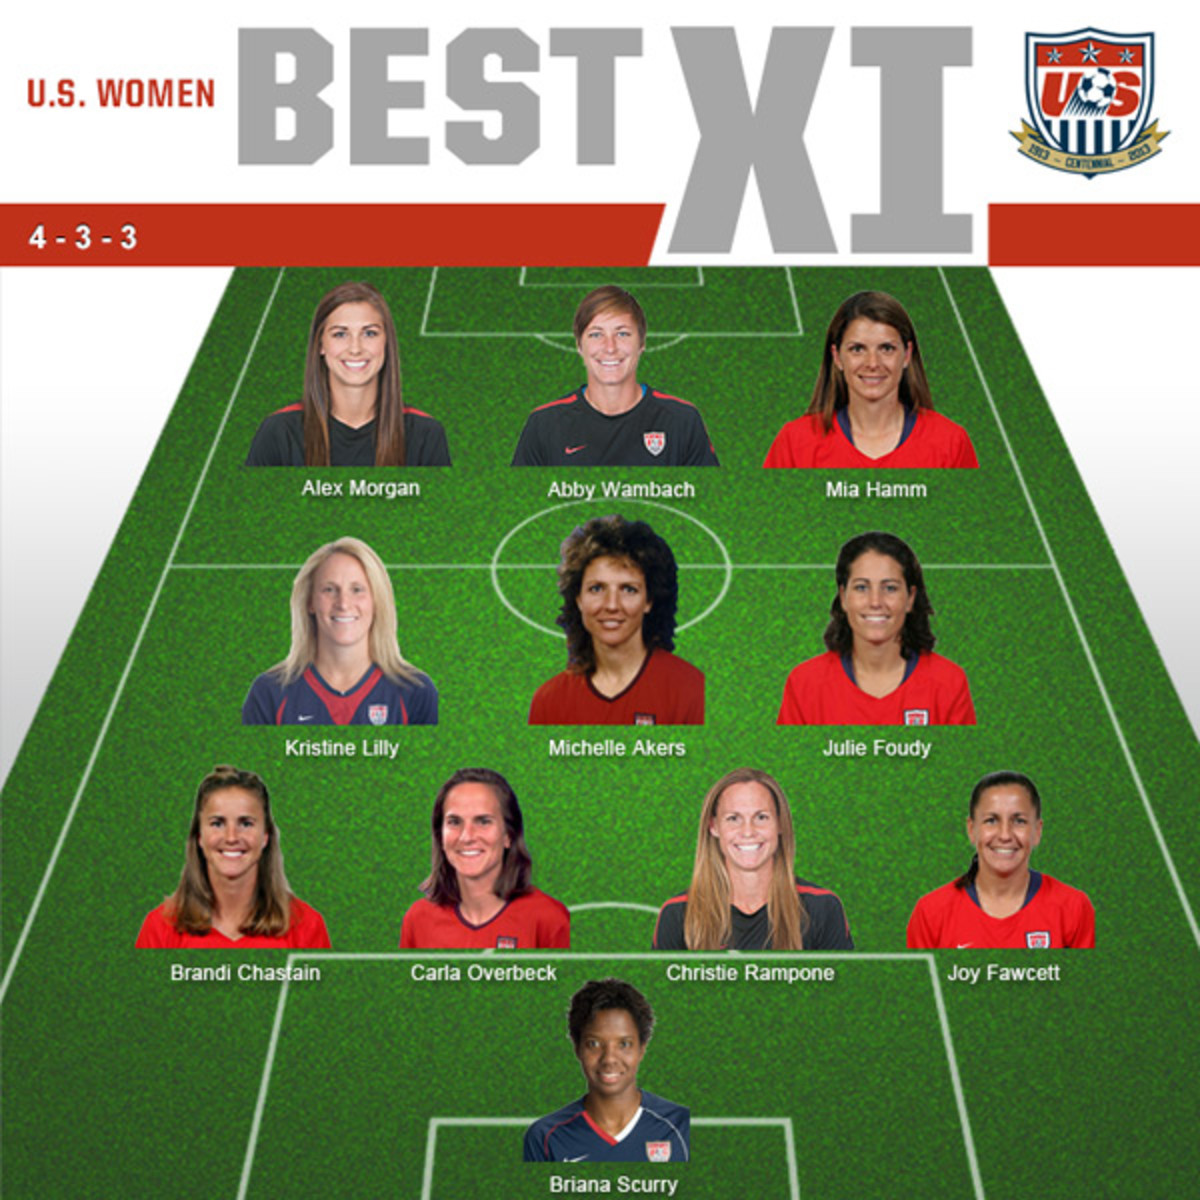 U.S. Women's Best XI